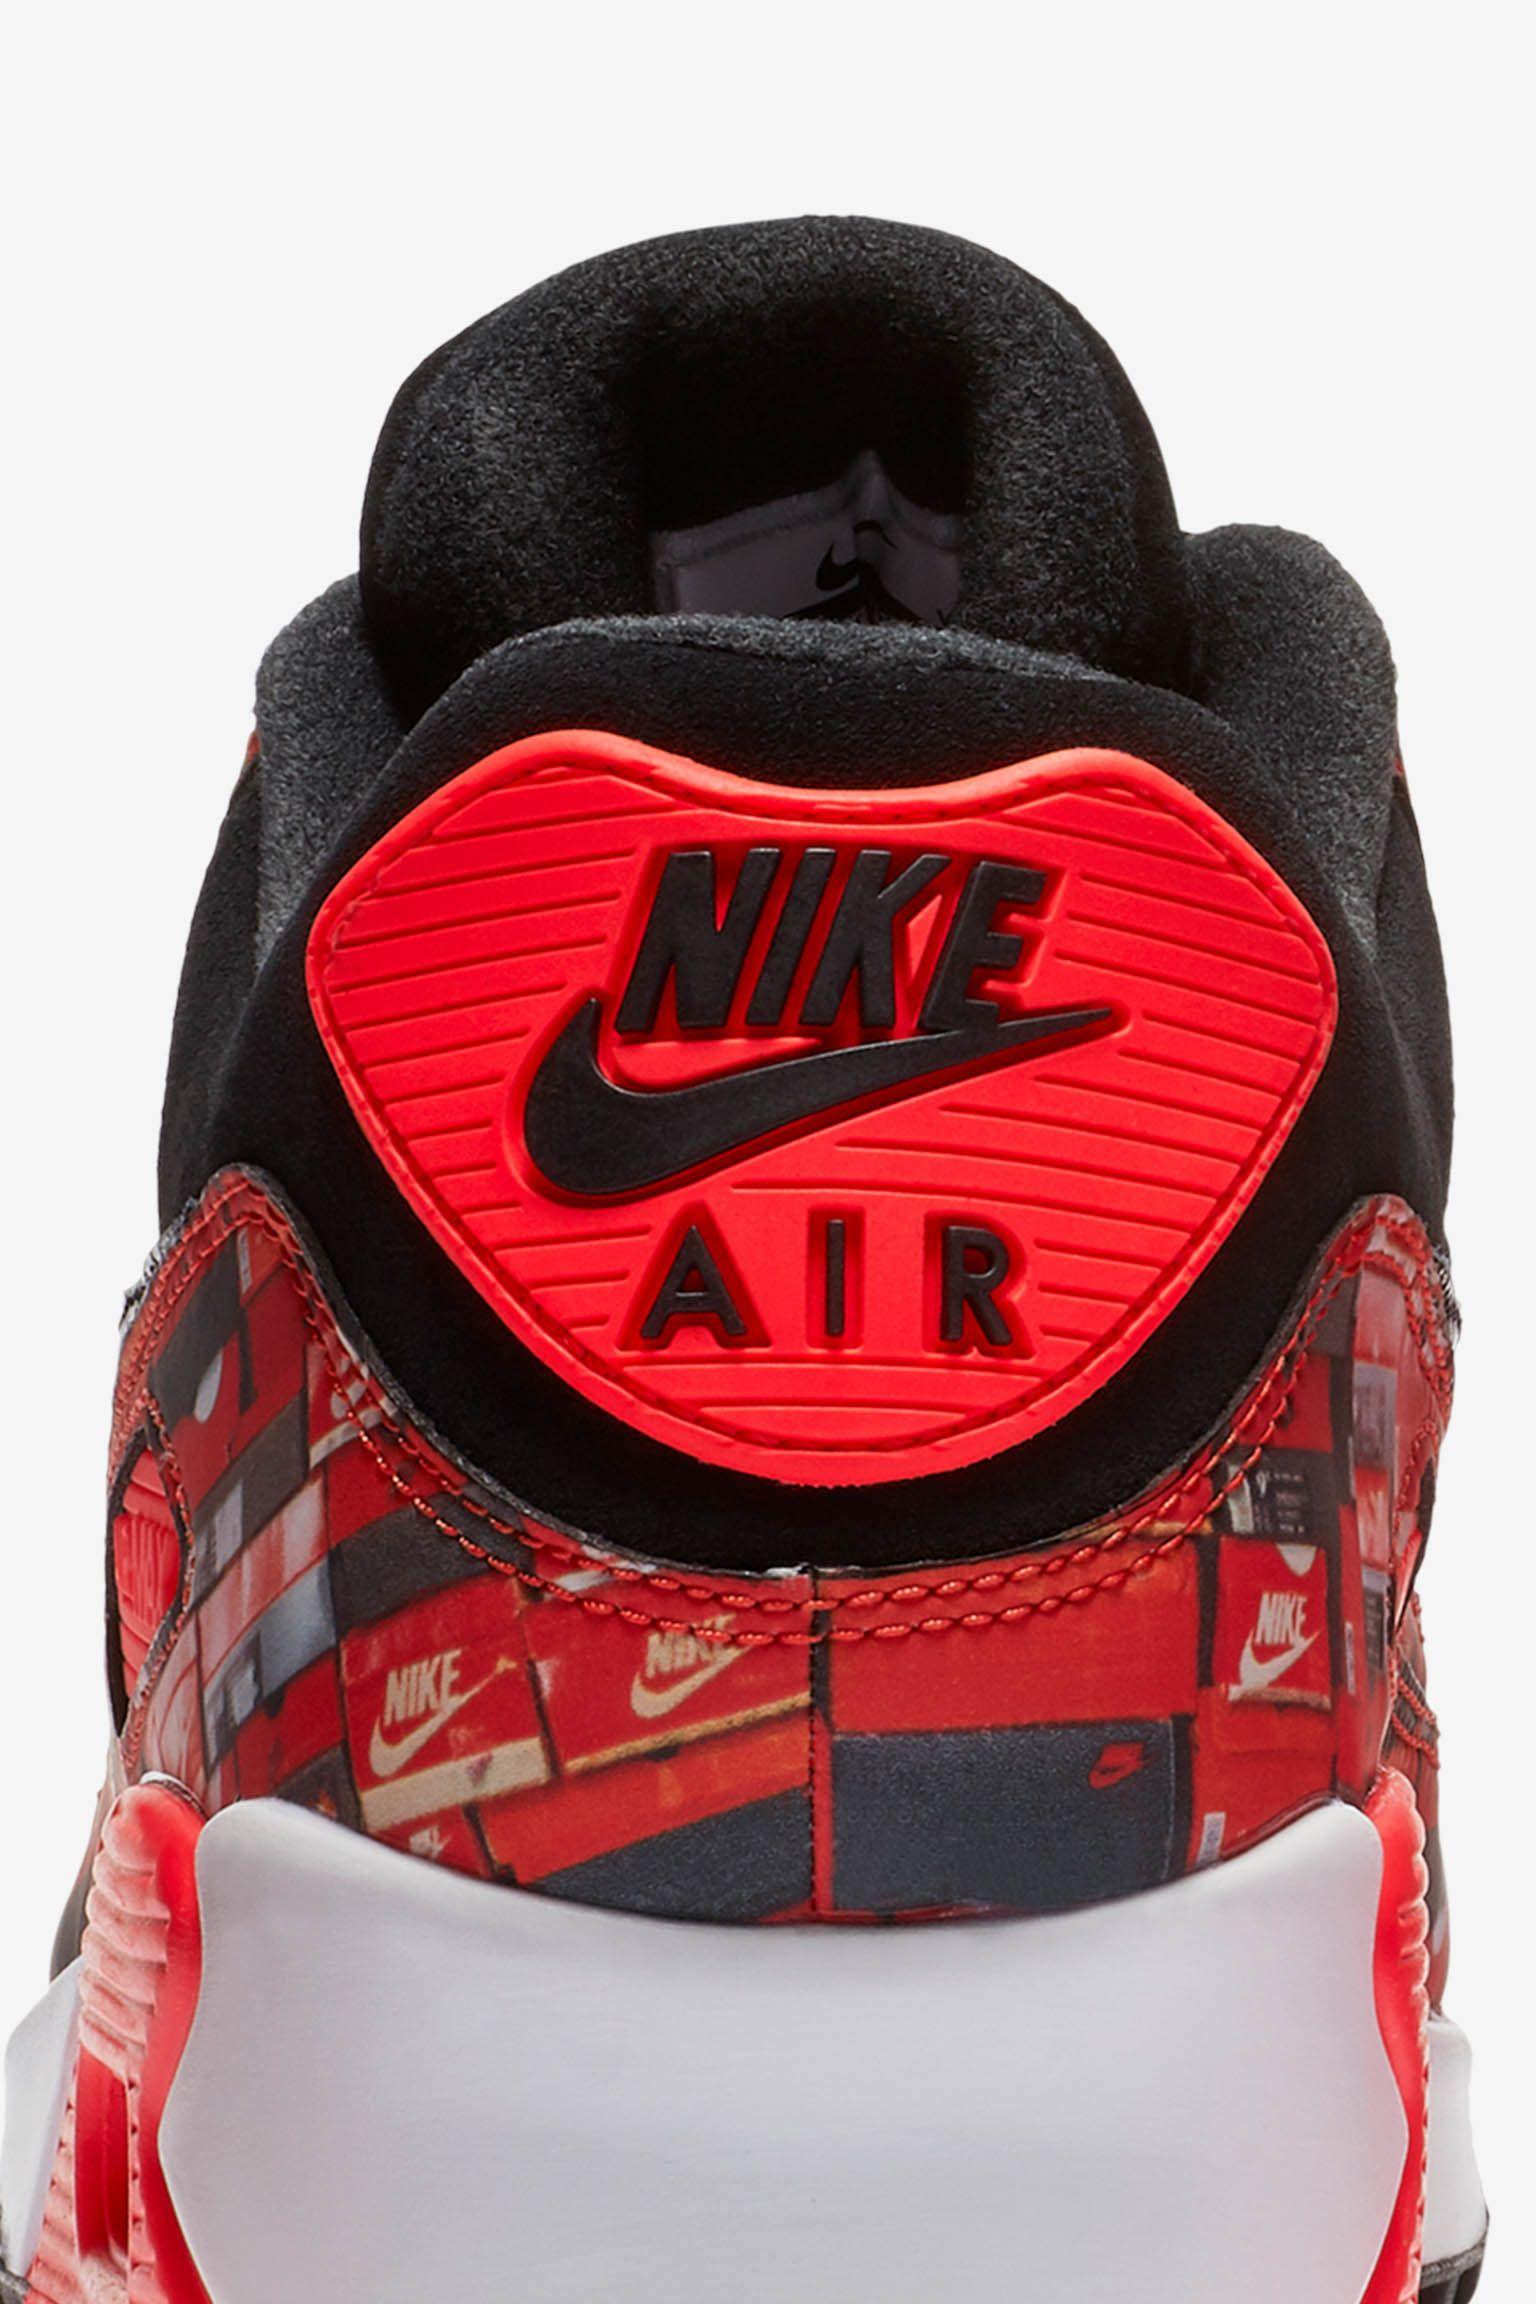 Nike Air Max 90 Atmos 'We Love Nike' Release Date